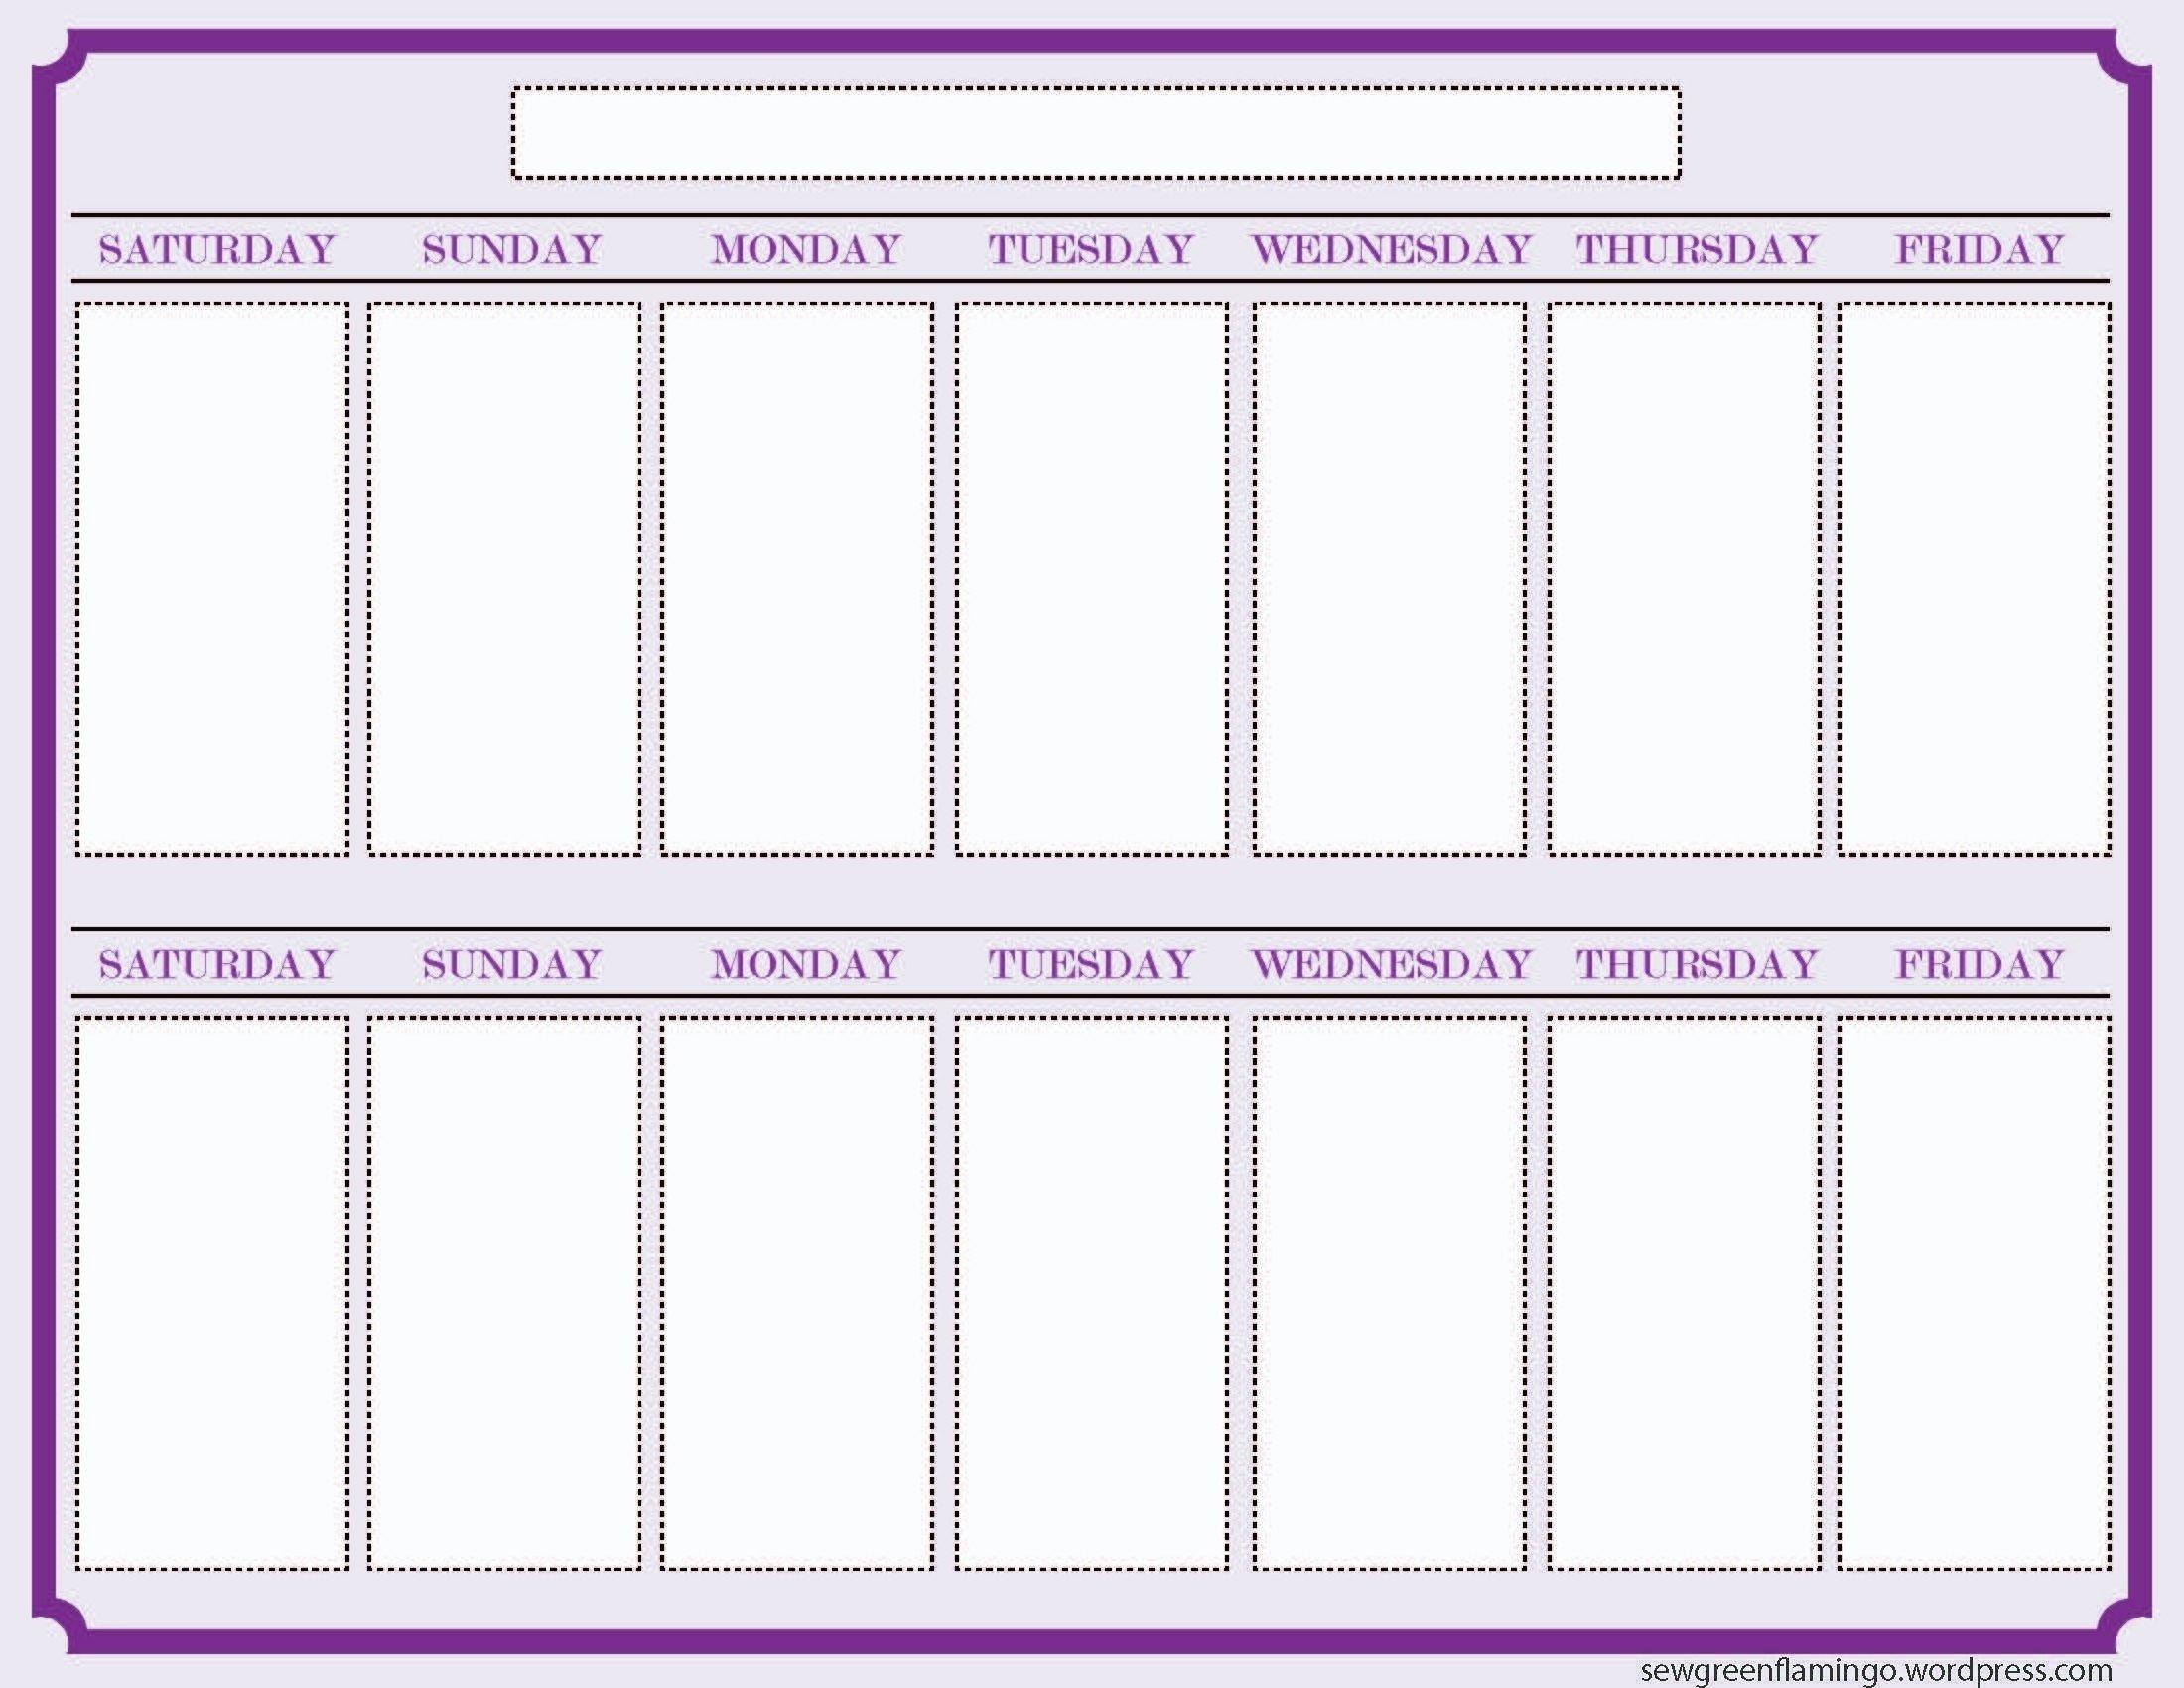 2 Week Calendar Printable Calendar - Calendar Inspiration 2 Week Prinatable Calendar